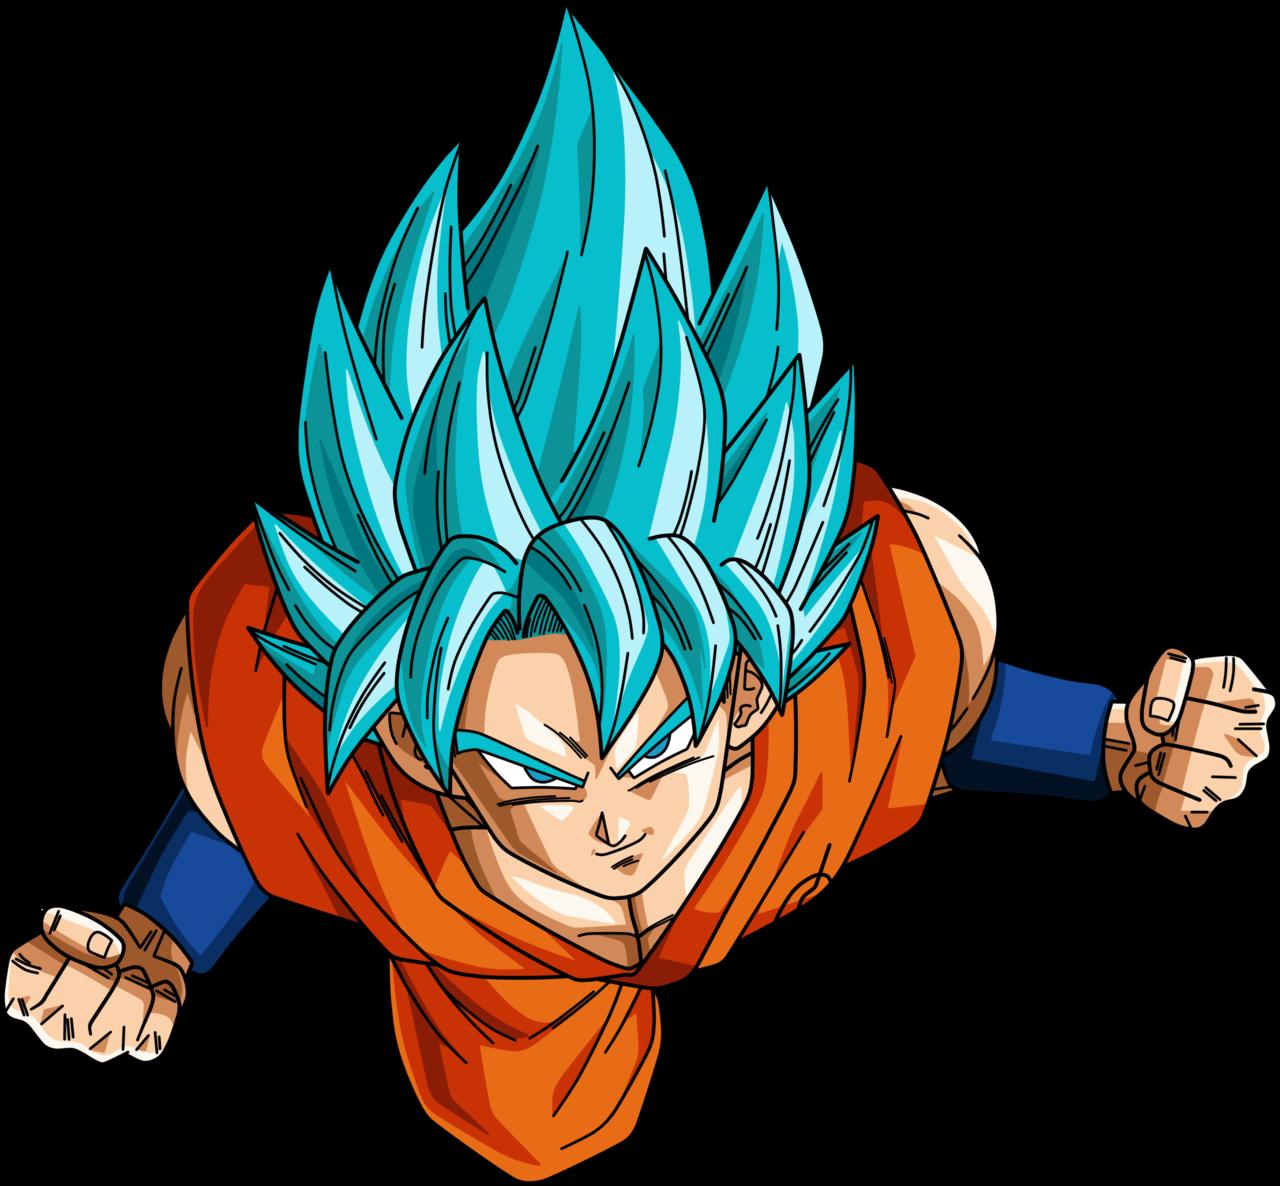 Son Goku Super Saiyan God Super Saiyan Goku Super Saiyan God Goku Super Saiyan Blue Goku Super Saiyan